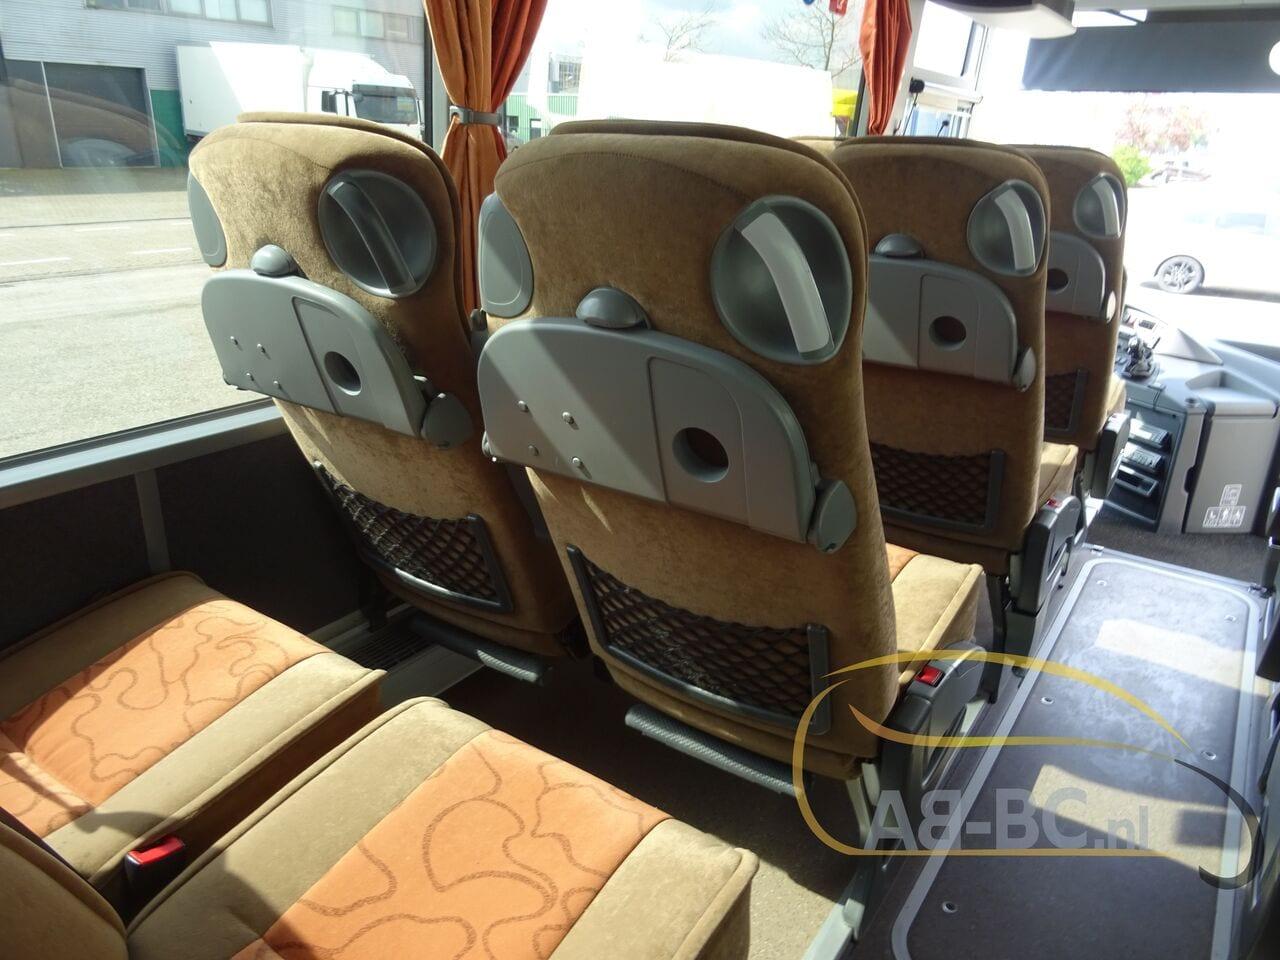 coach-busSETRA-S416H-48-SEATS-LIFTBUS---1620309989448239754_big_a31e124971adc50af2fc946fc90df1e0--21050616581387095000